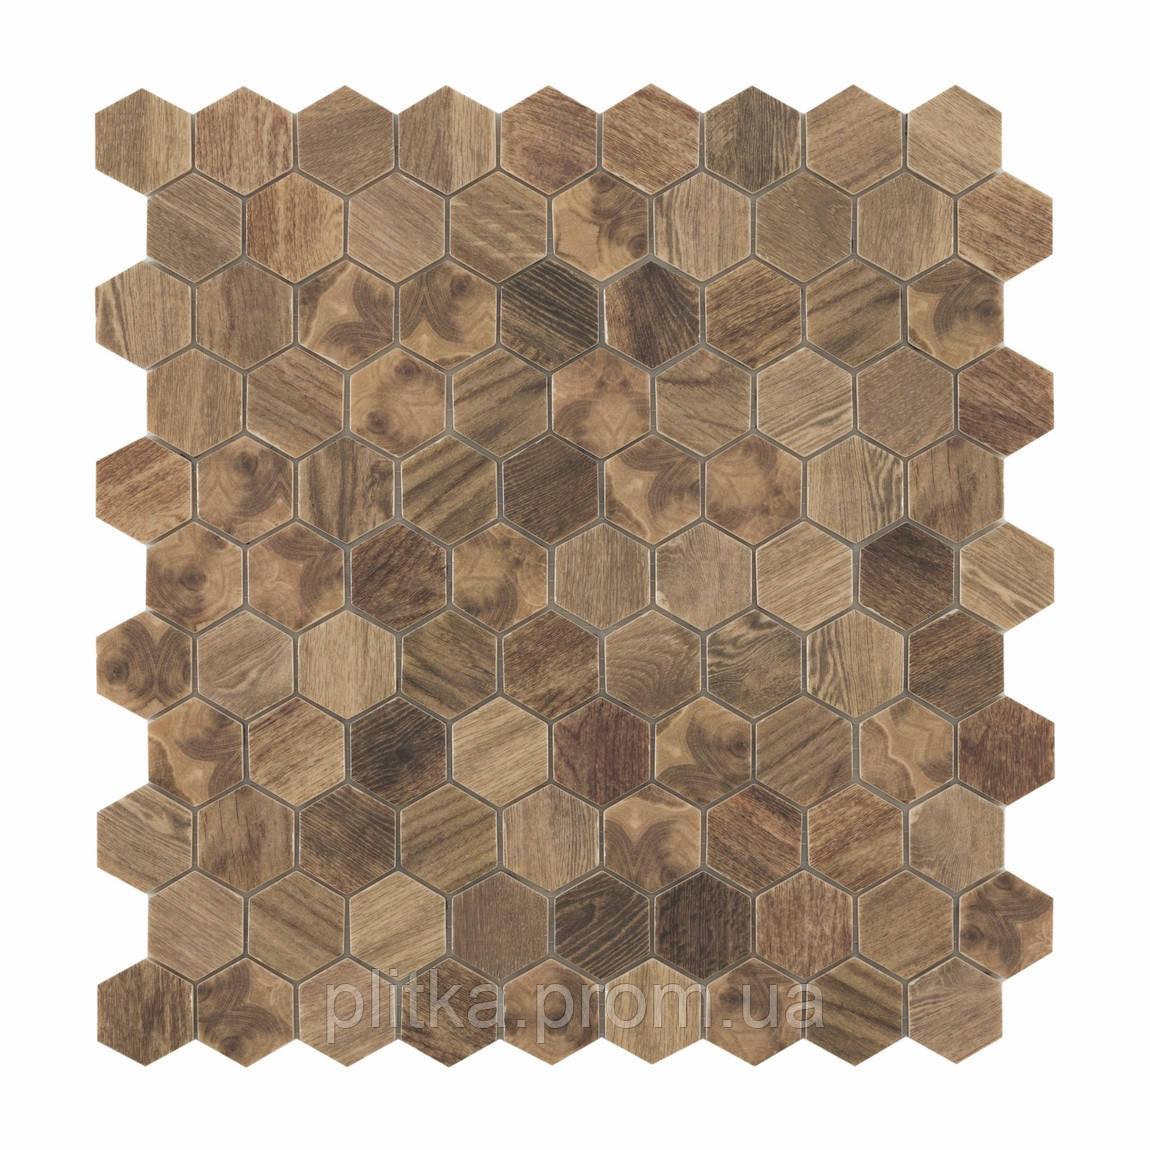 Мозаїка Honey Royal Light 4700 31,5*31,5